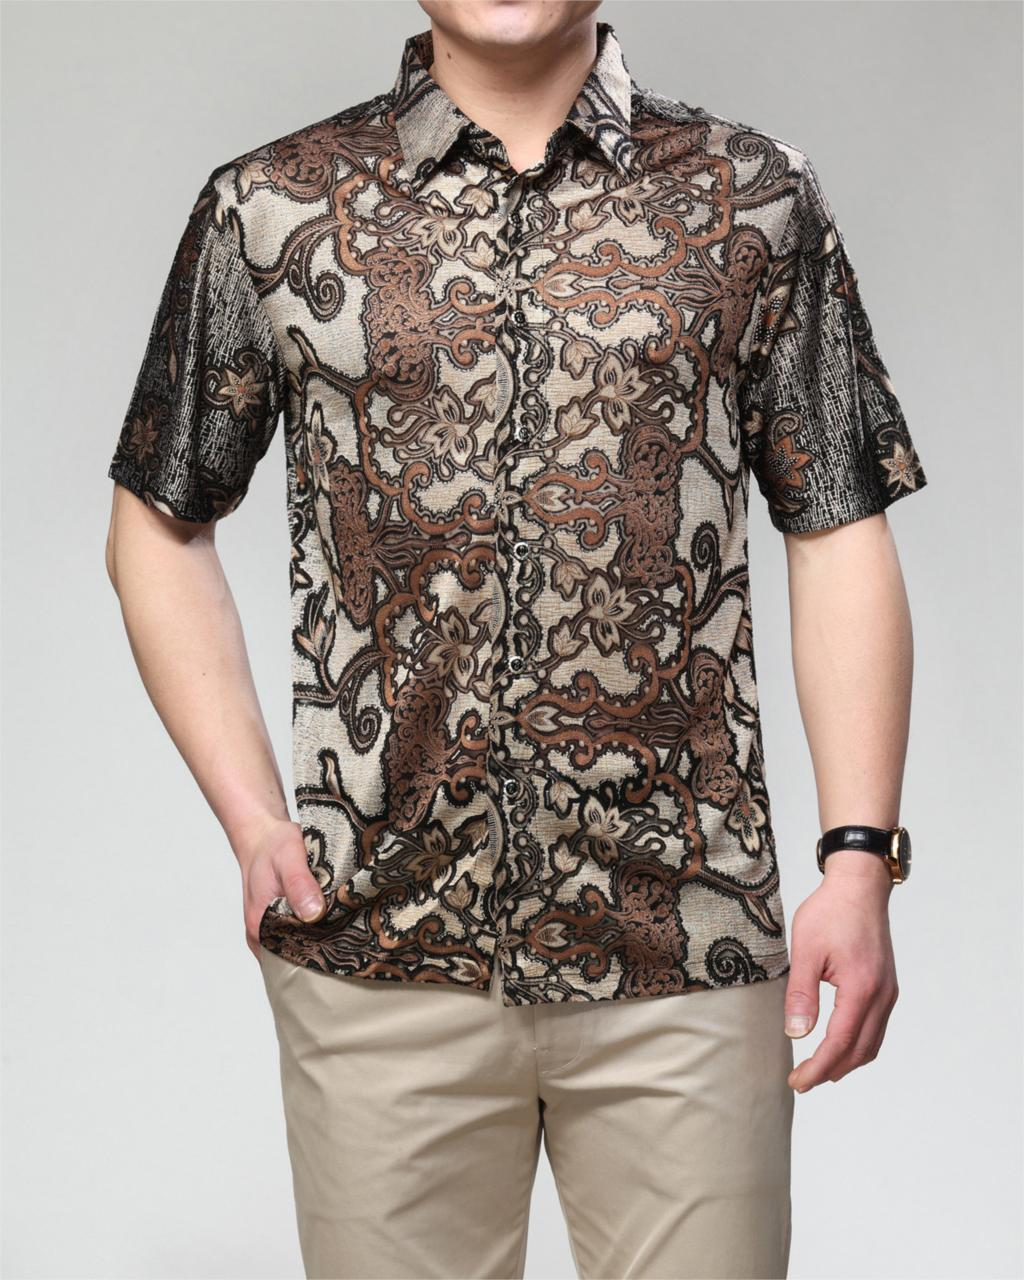 2015 New Summer Style Regular Silk Print Shirt Mens Short Sleeve